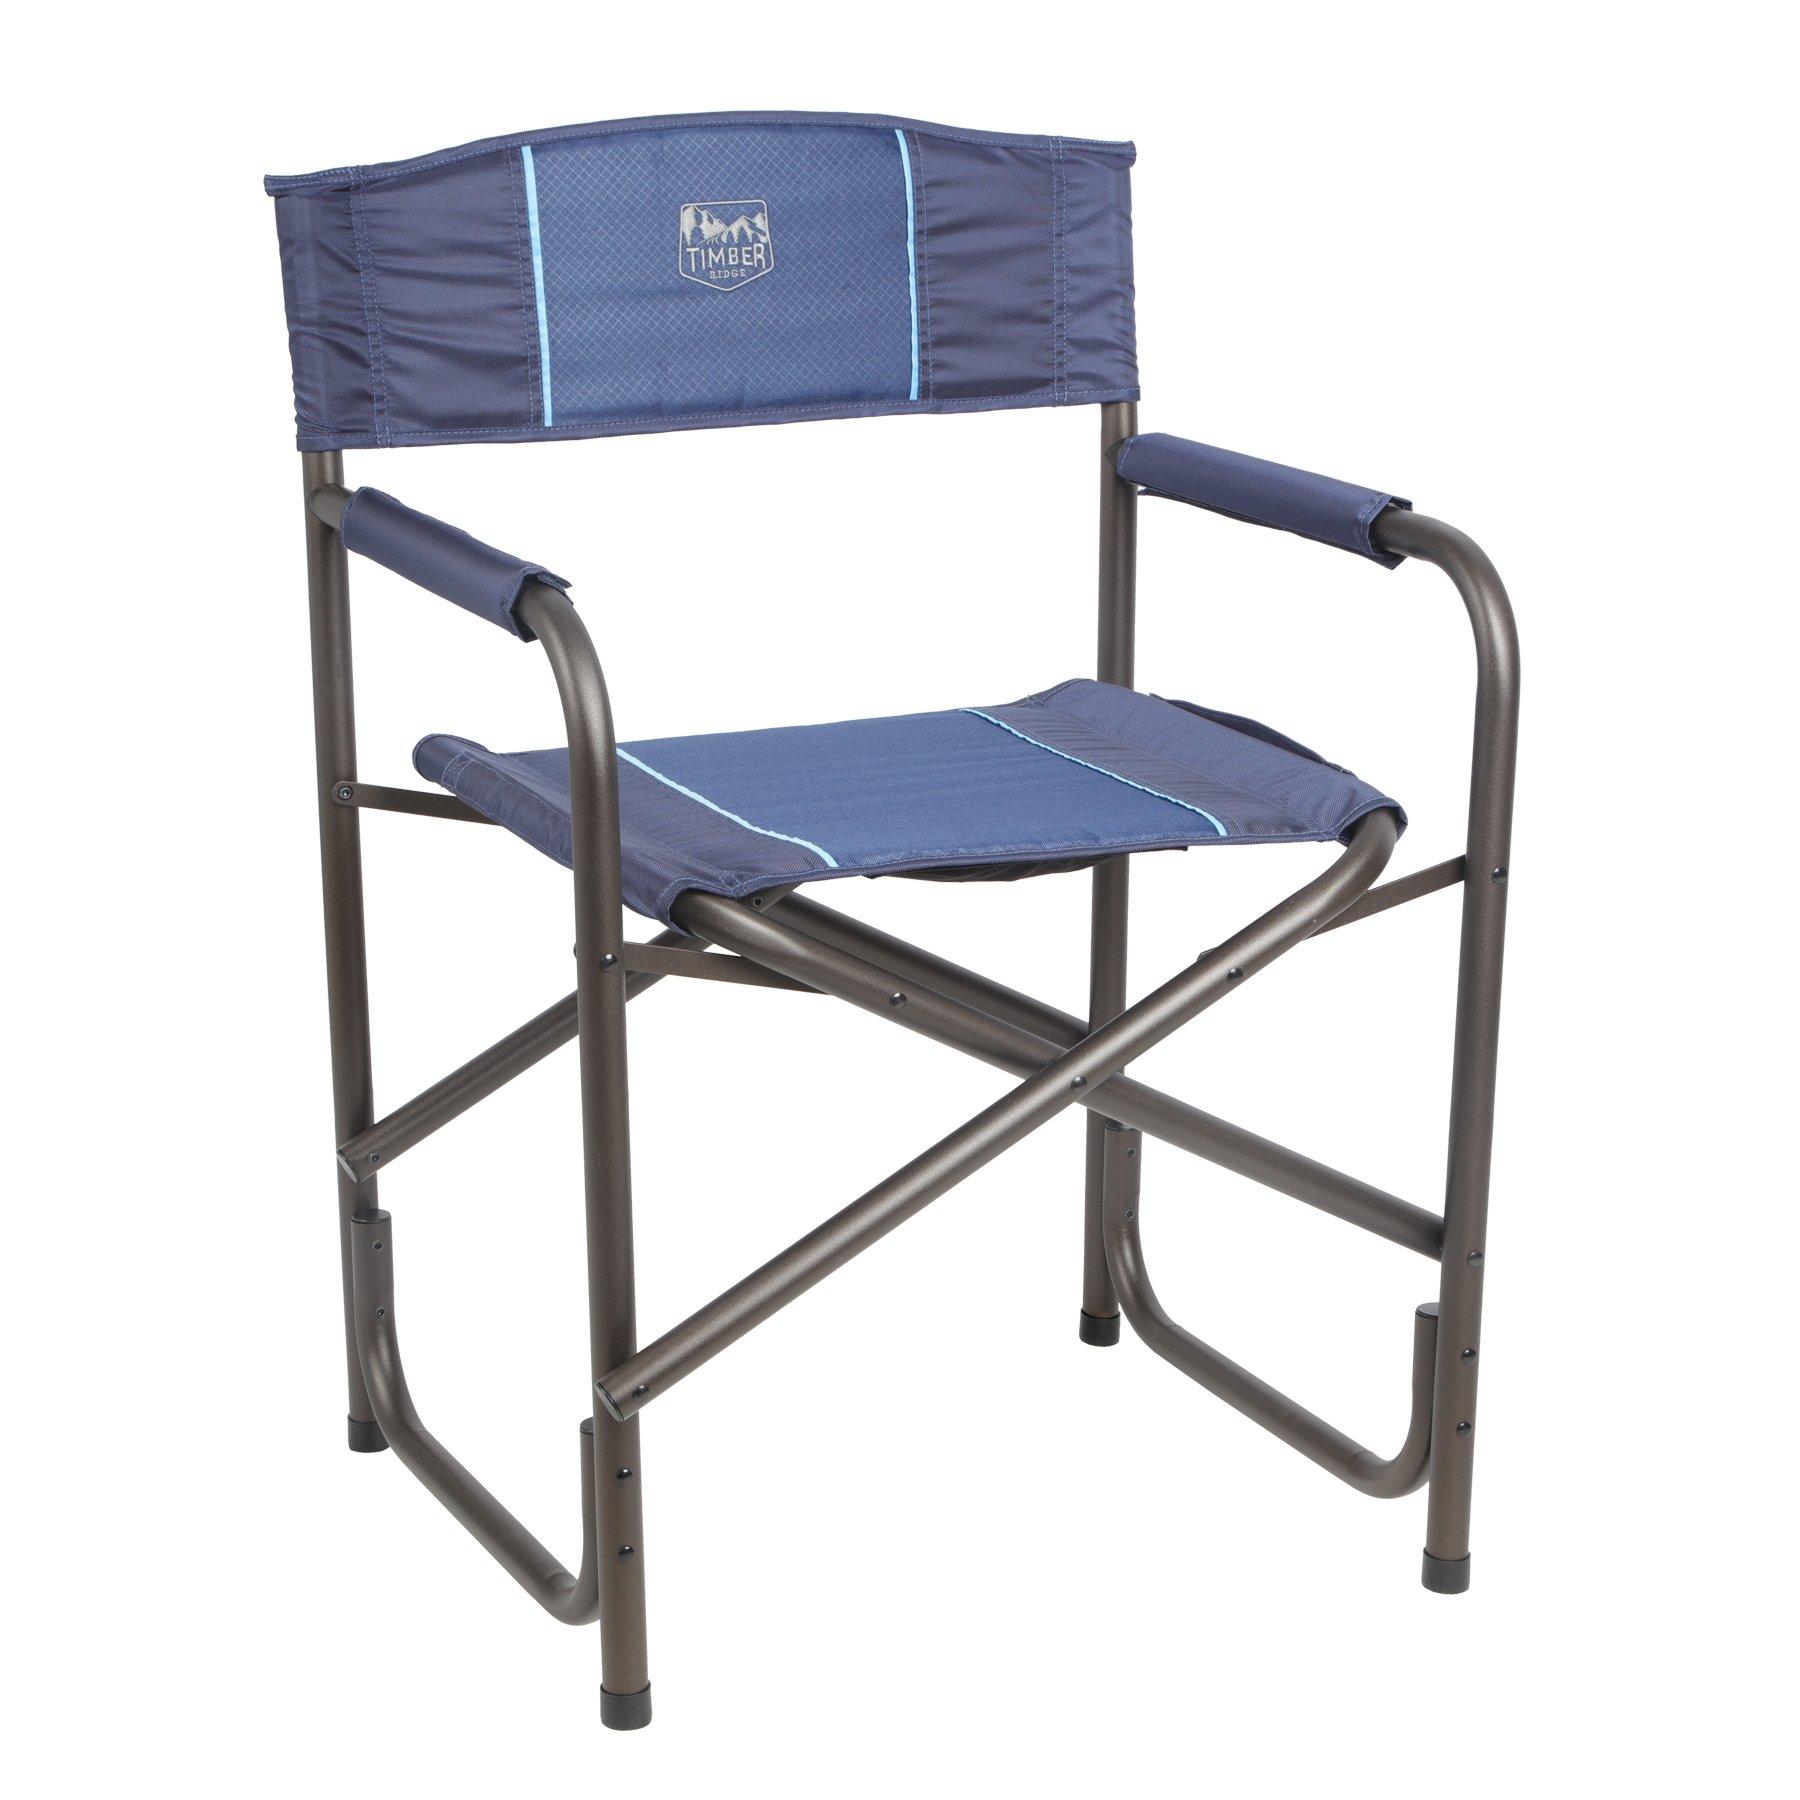 Timber Ridge Viburnum Folding Director's Chair, Blue by Timber Ridge